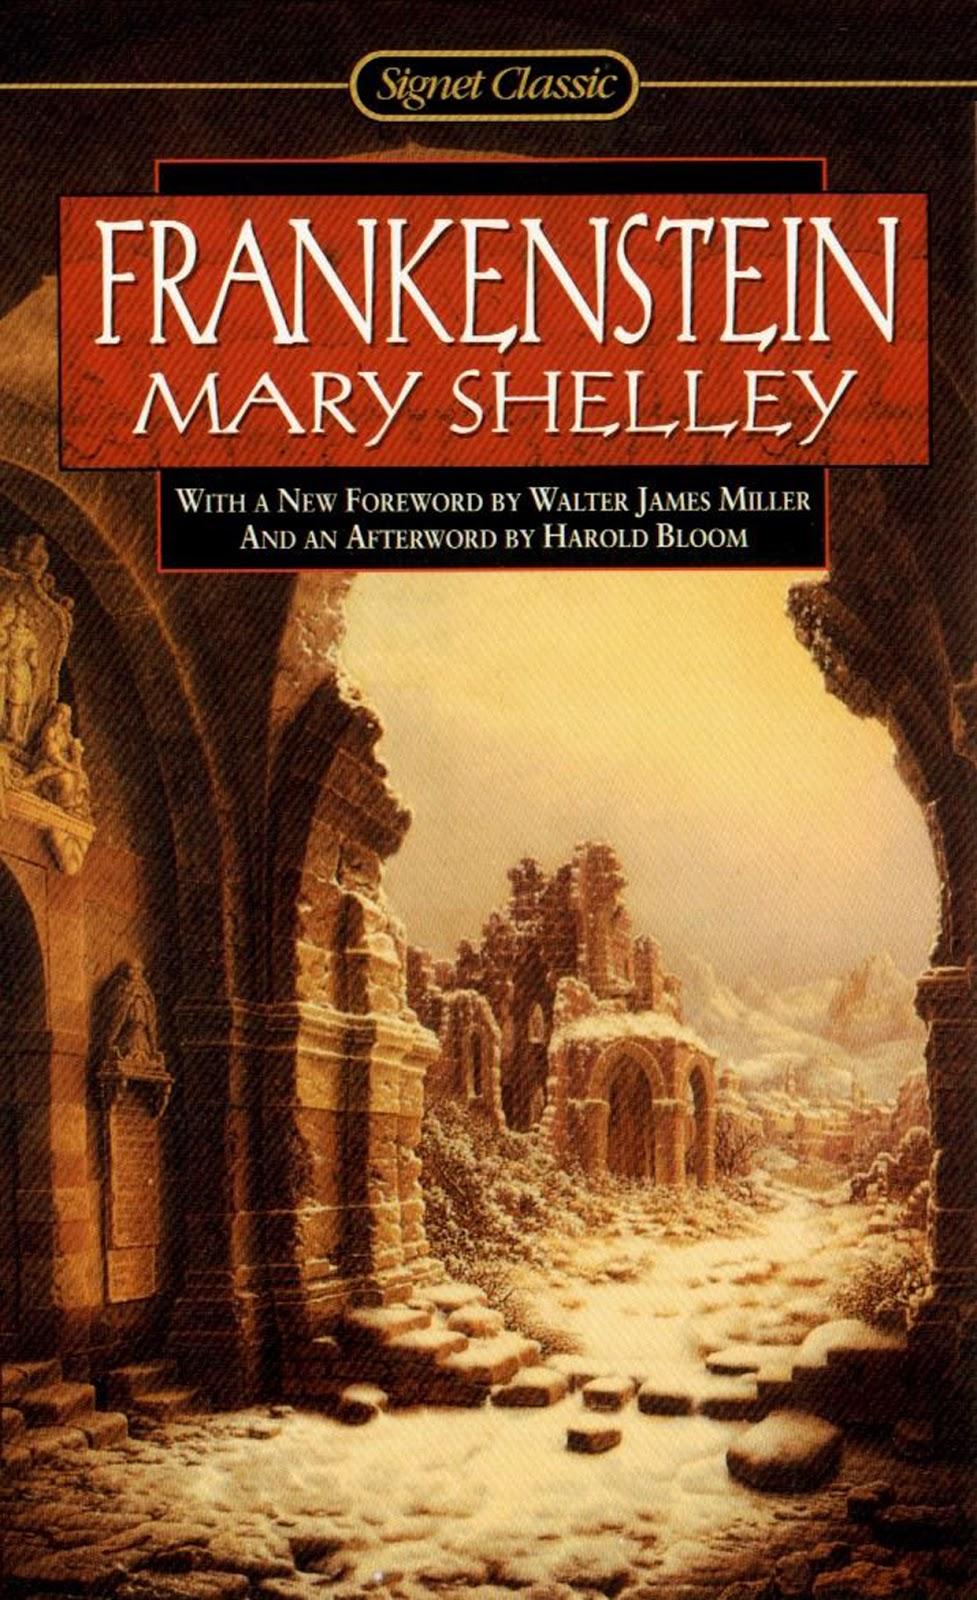 mary shelleys novel frankenstein essay